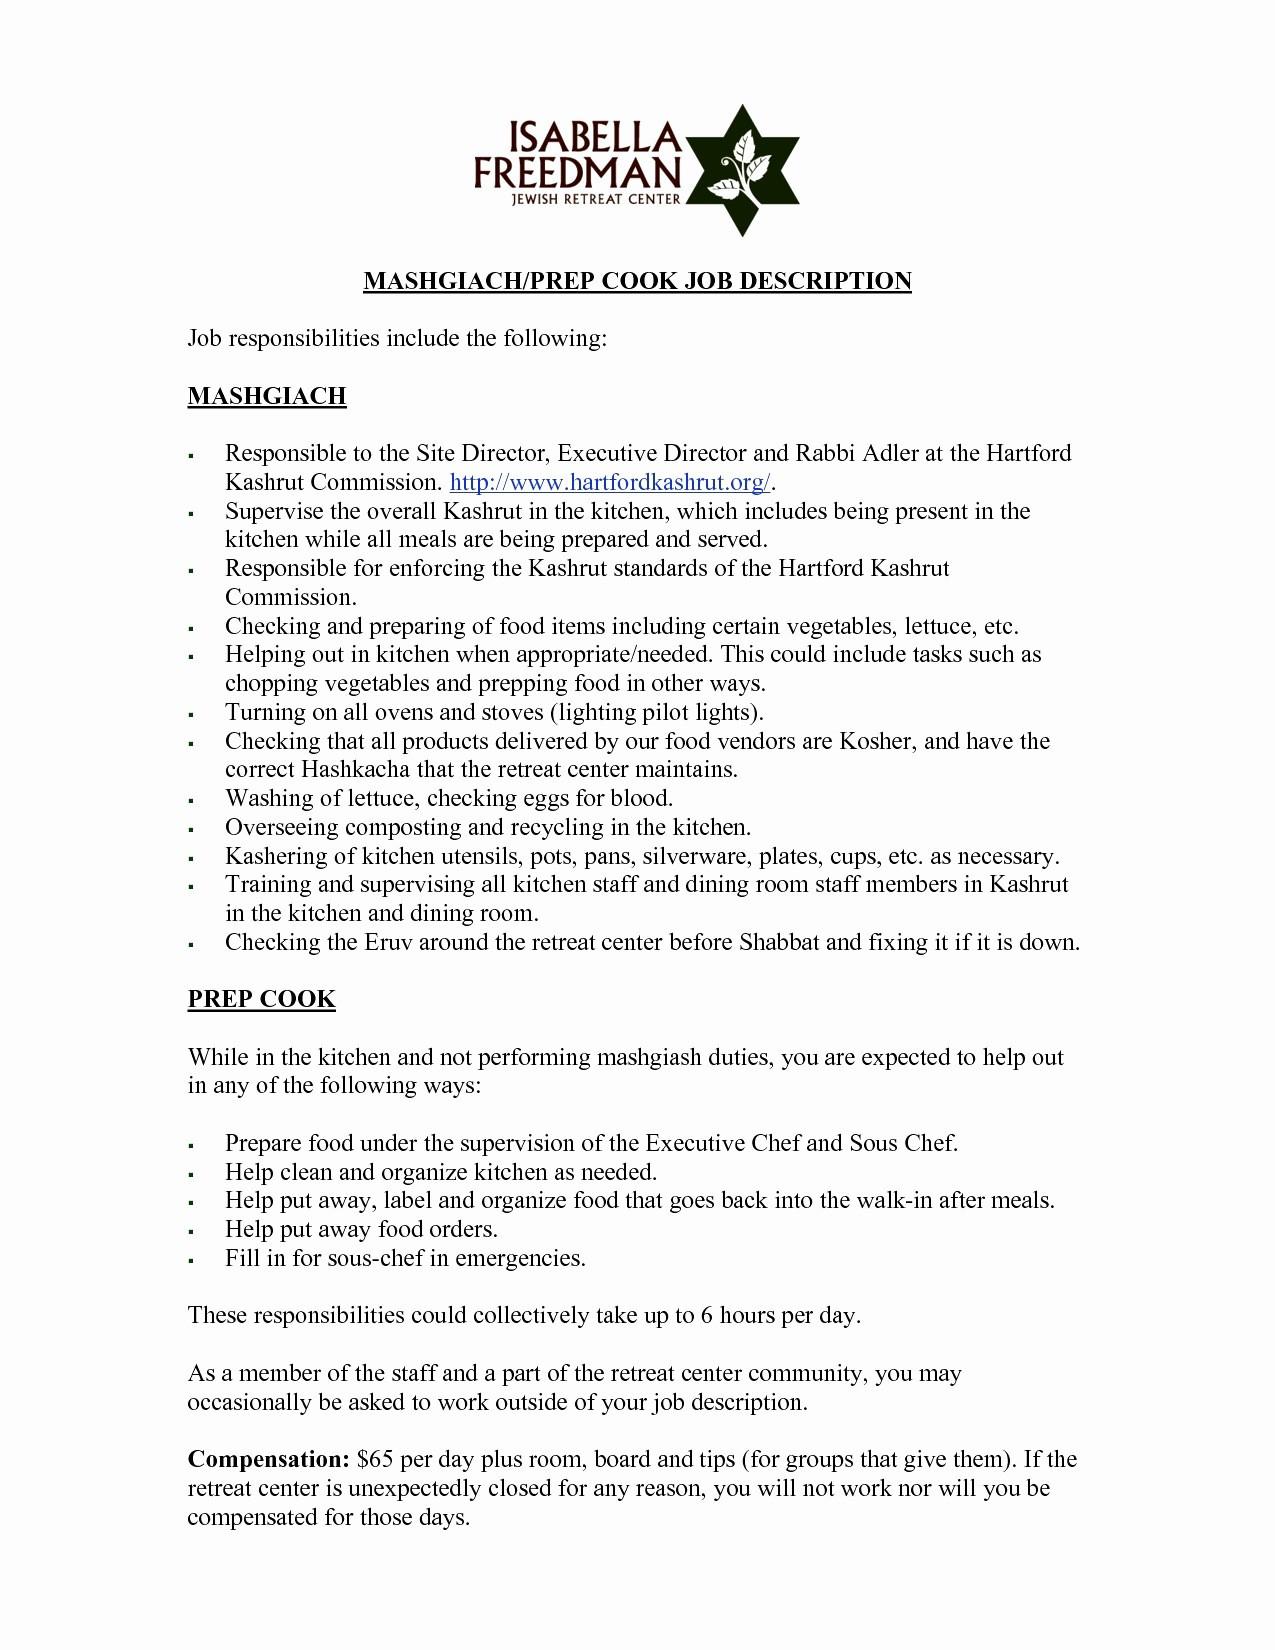 Cover Letter Template Fill In - Sample Application Letter for Job order New Resume Doc Template